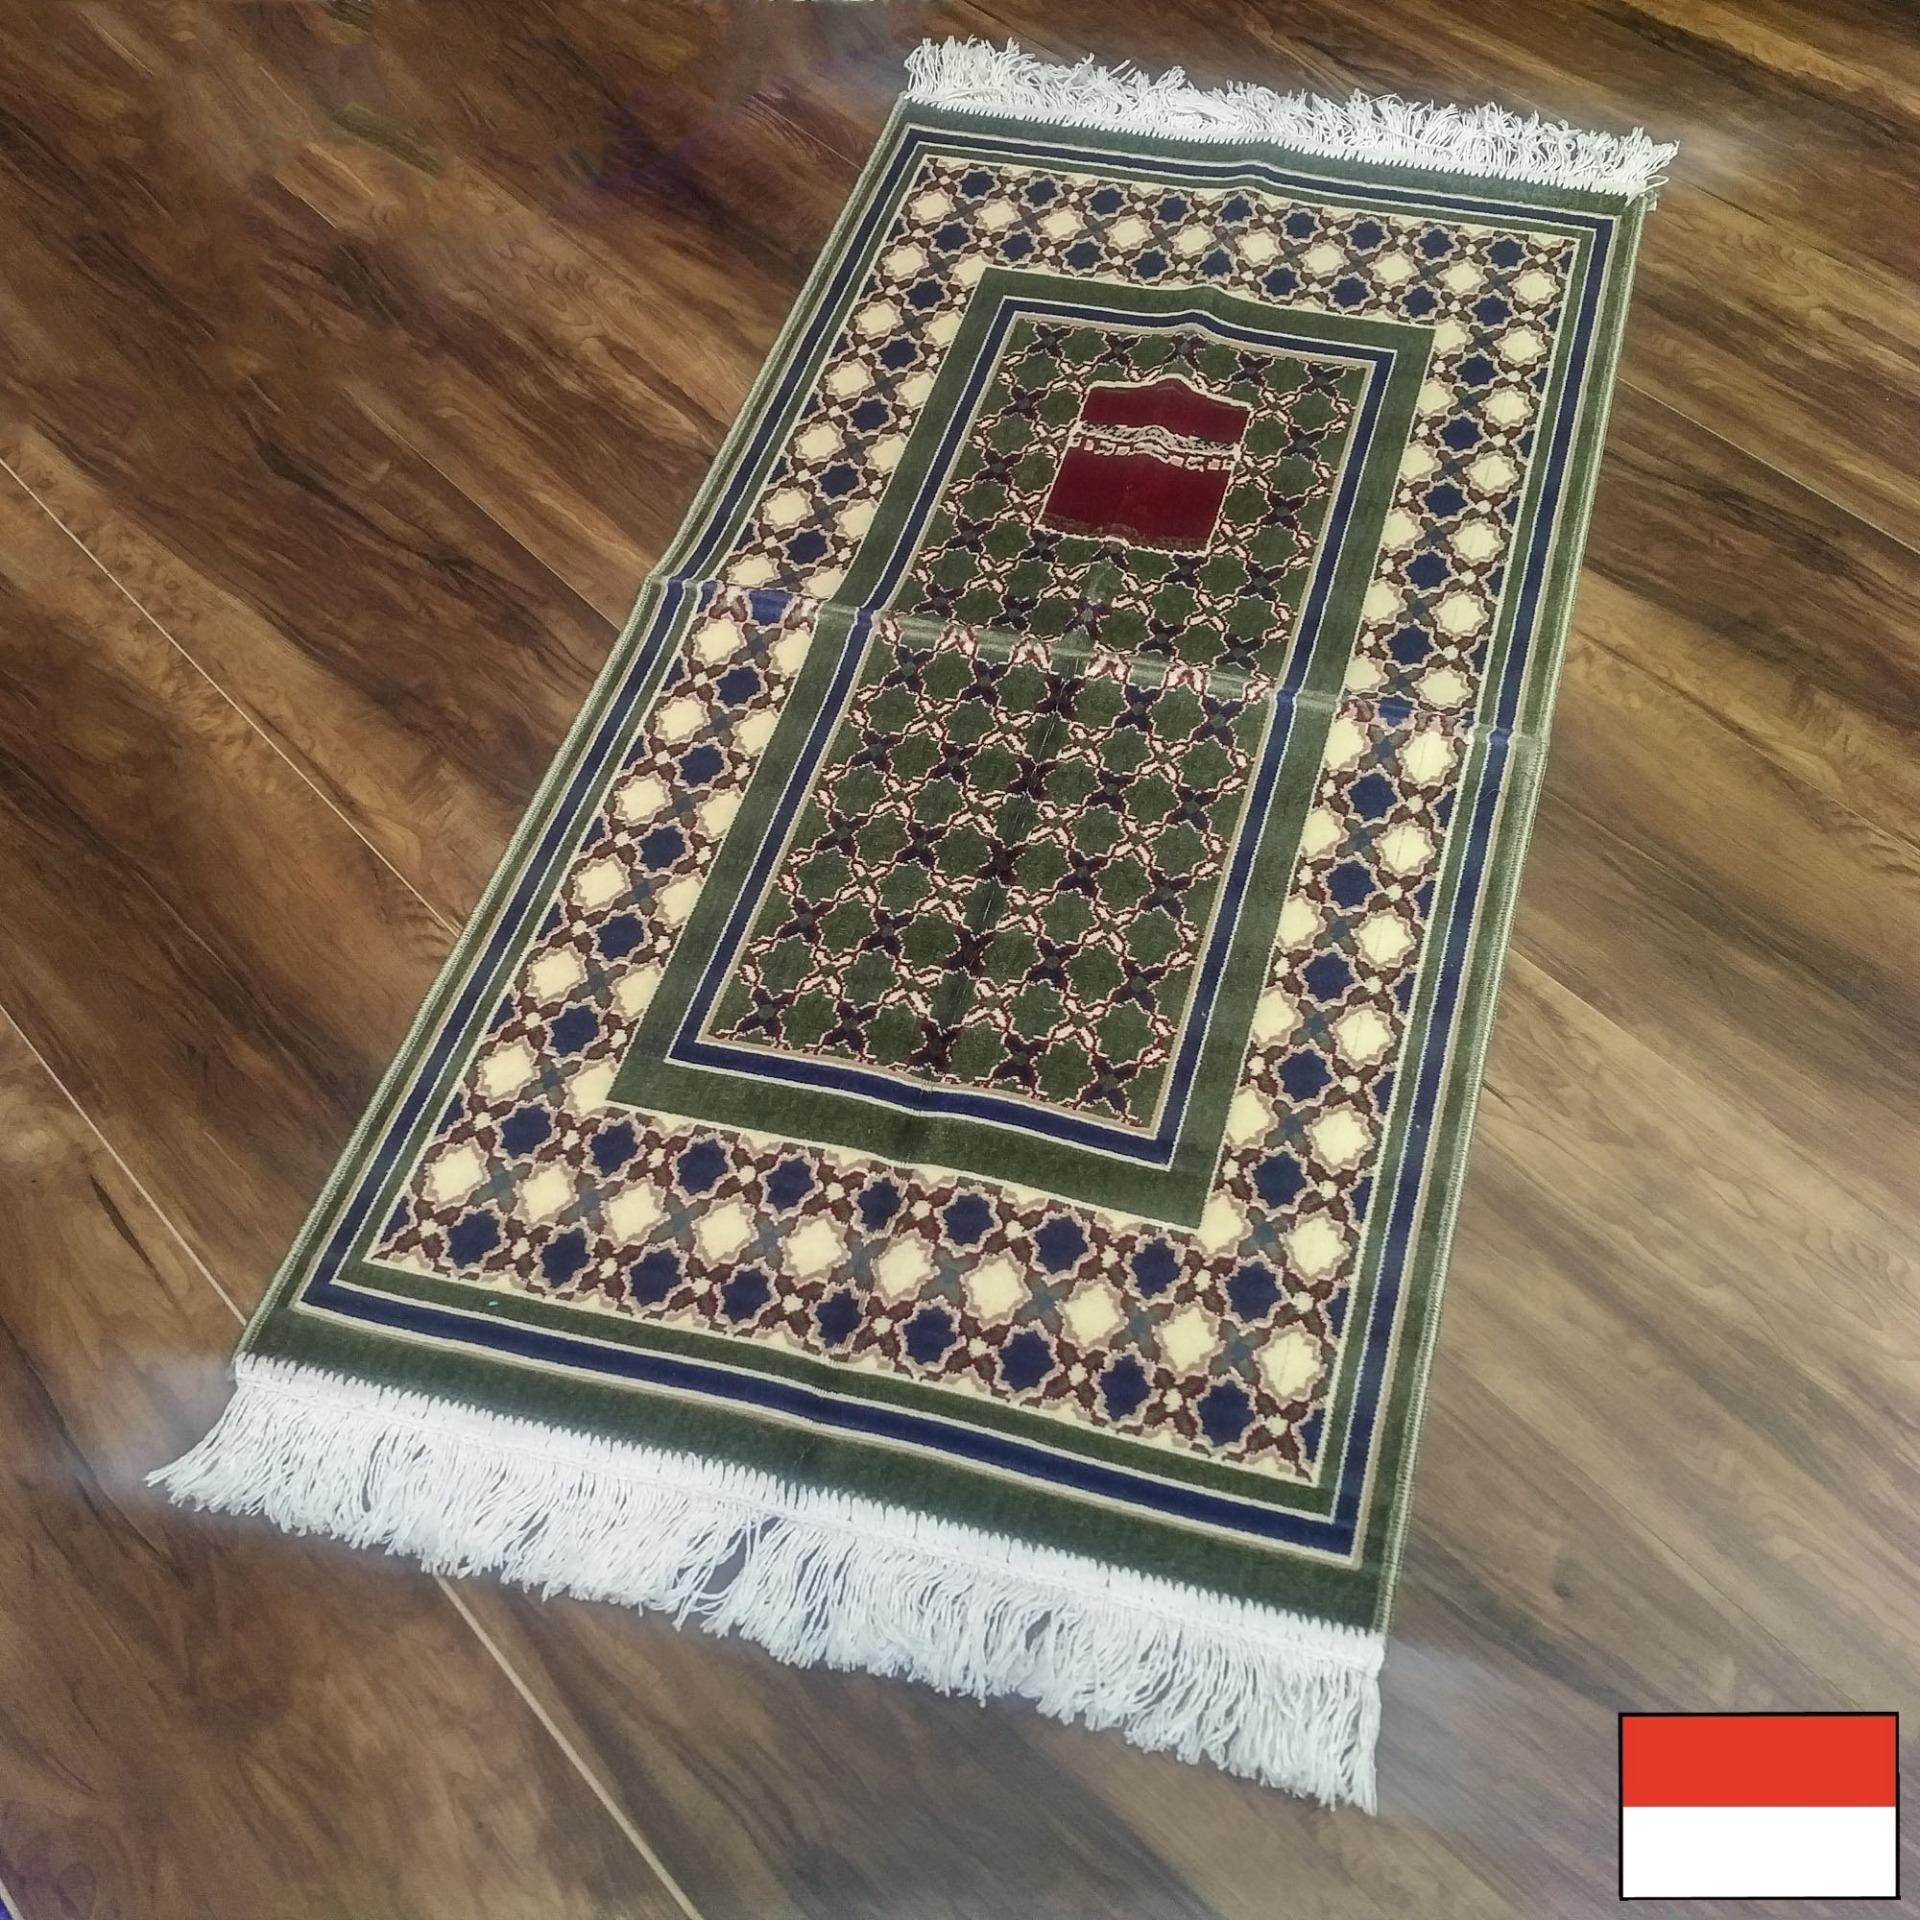 Sajadah Roll Rajakhand 120 X 600 Cm 969000 Hijau Spec Dan Daftar Aisyah Ukuran 80 Muda Masjid Mada Saudi Arabia Midi Soft Polypropylene 52 103